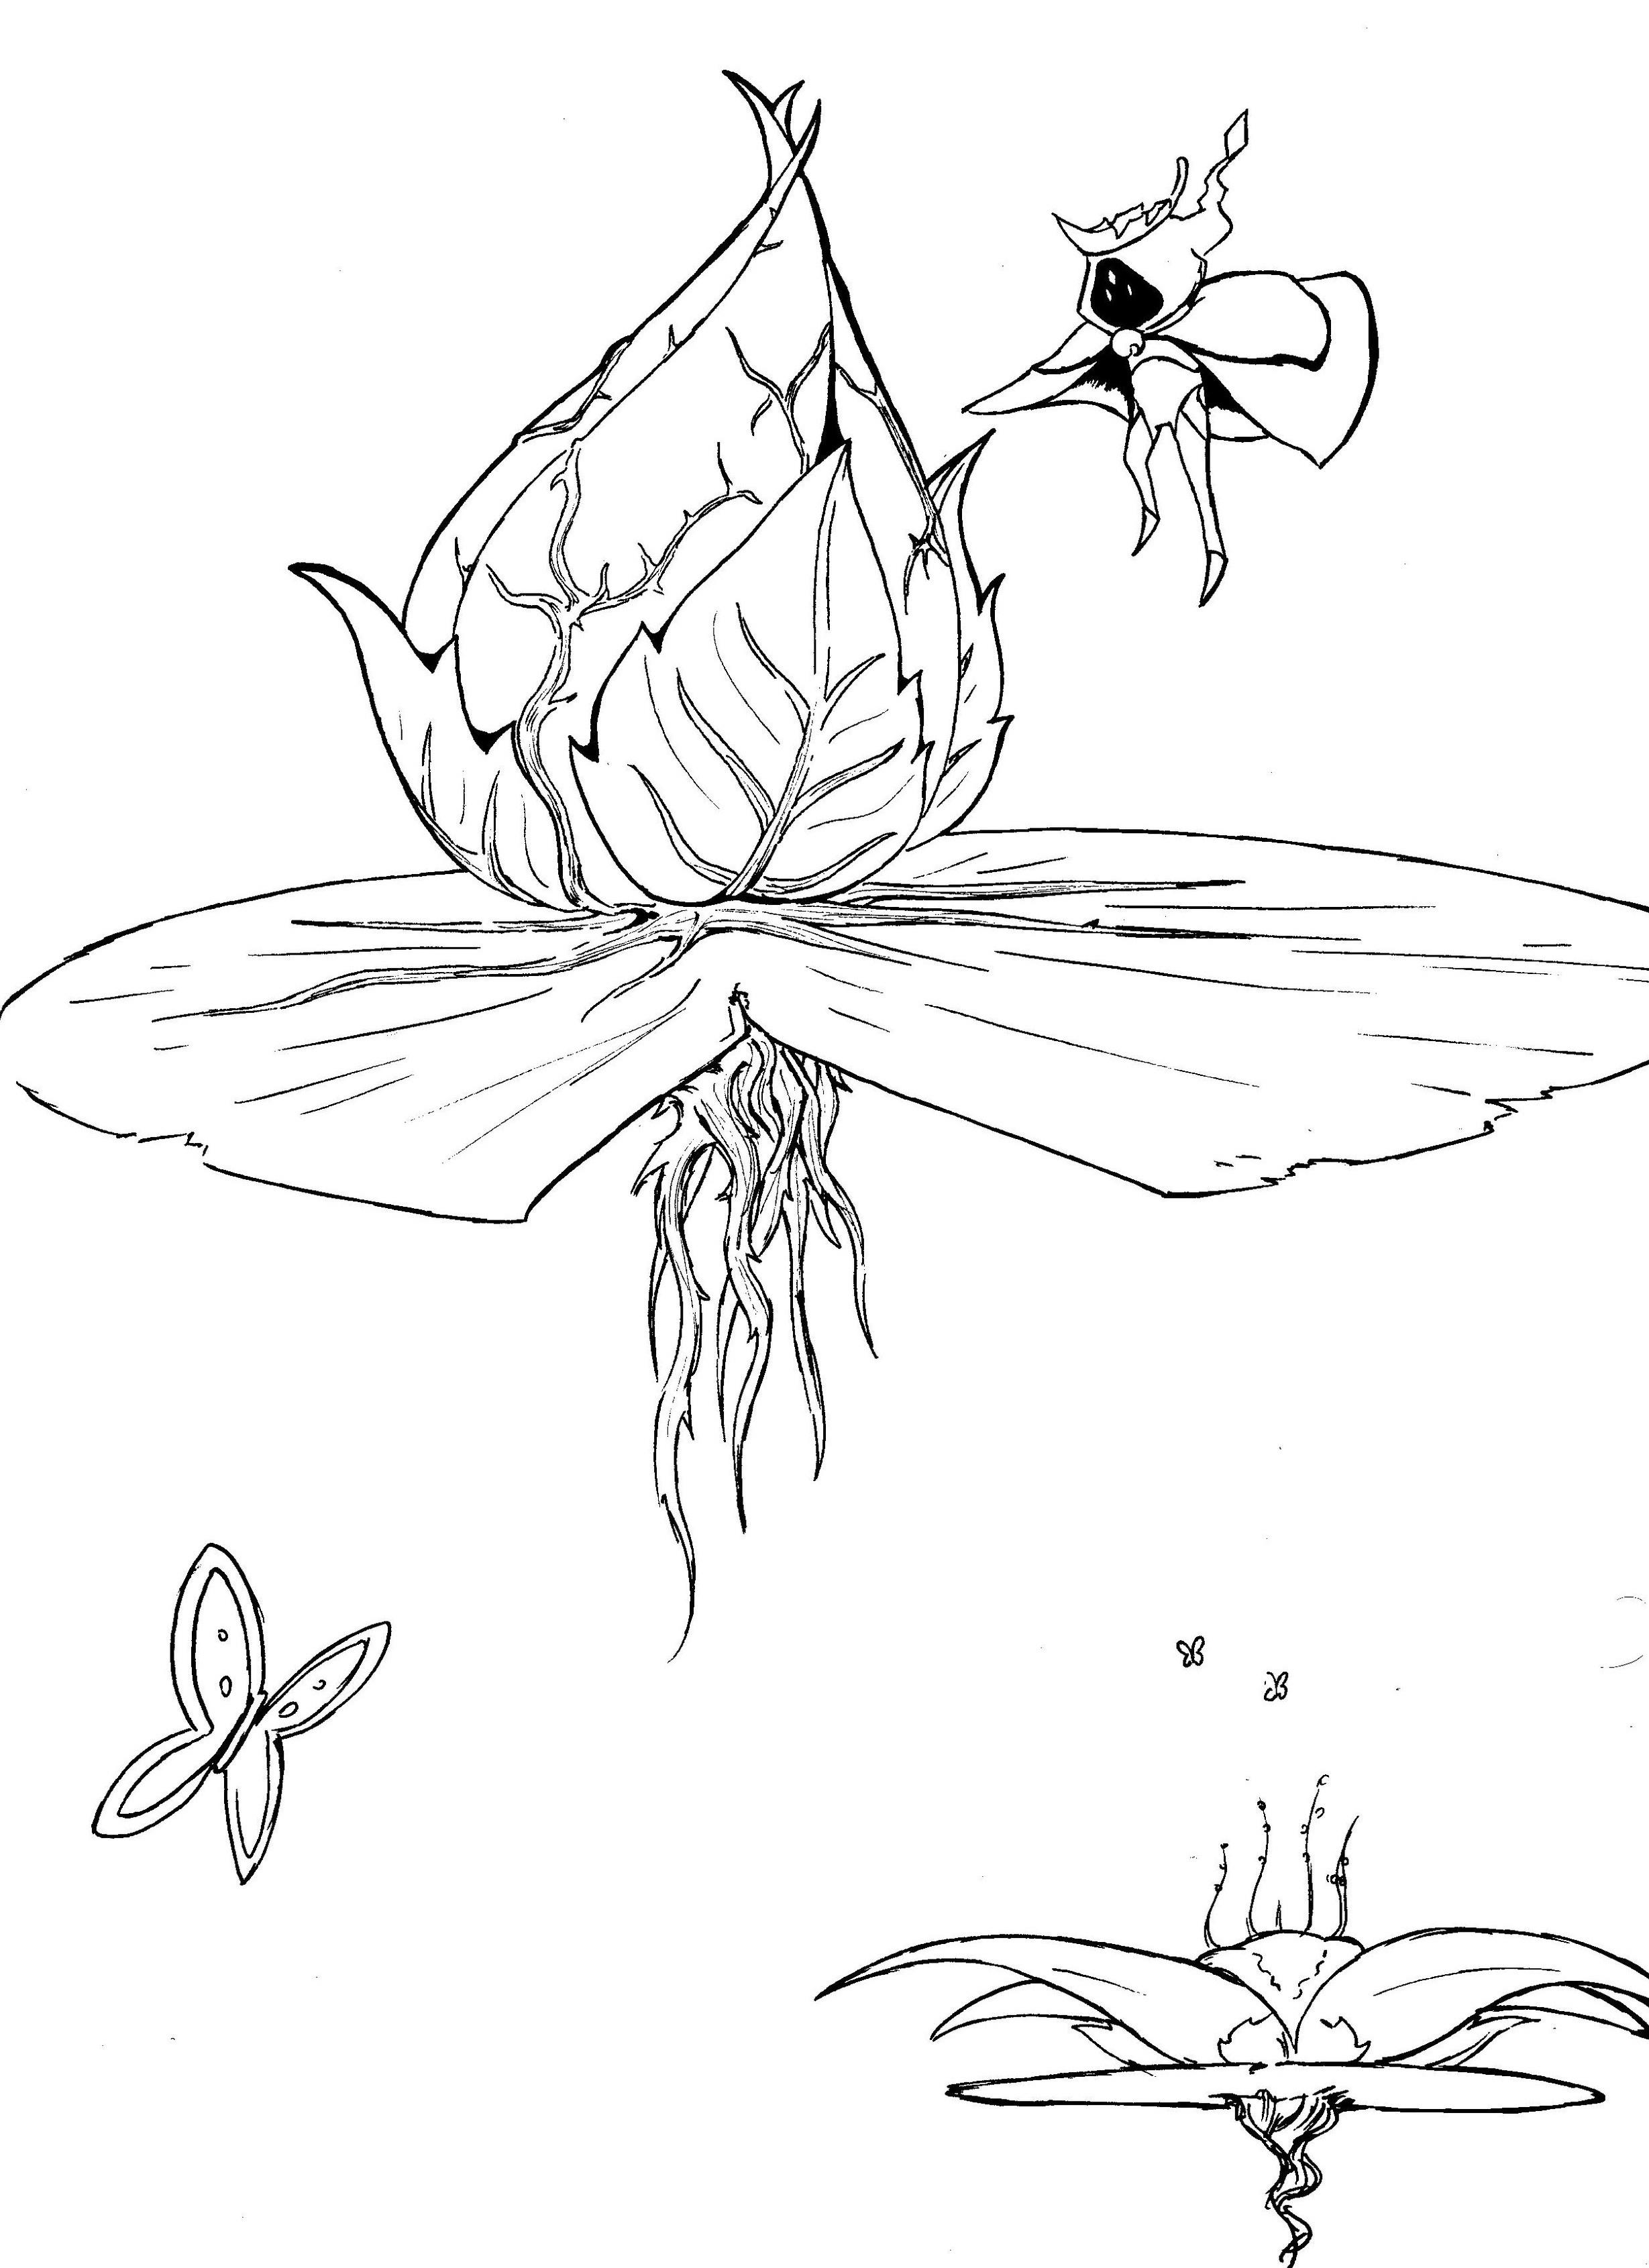 Lily+Pad.jpeg.jpg